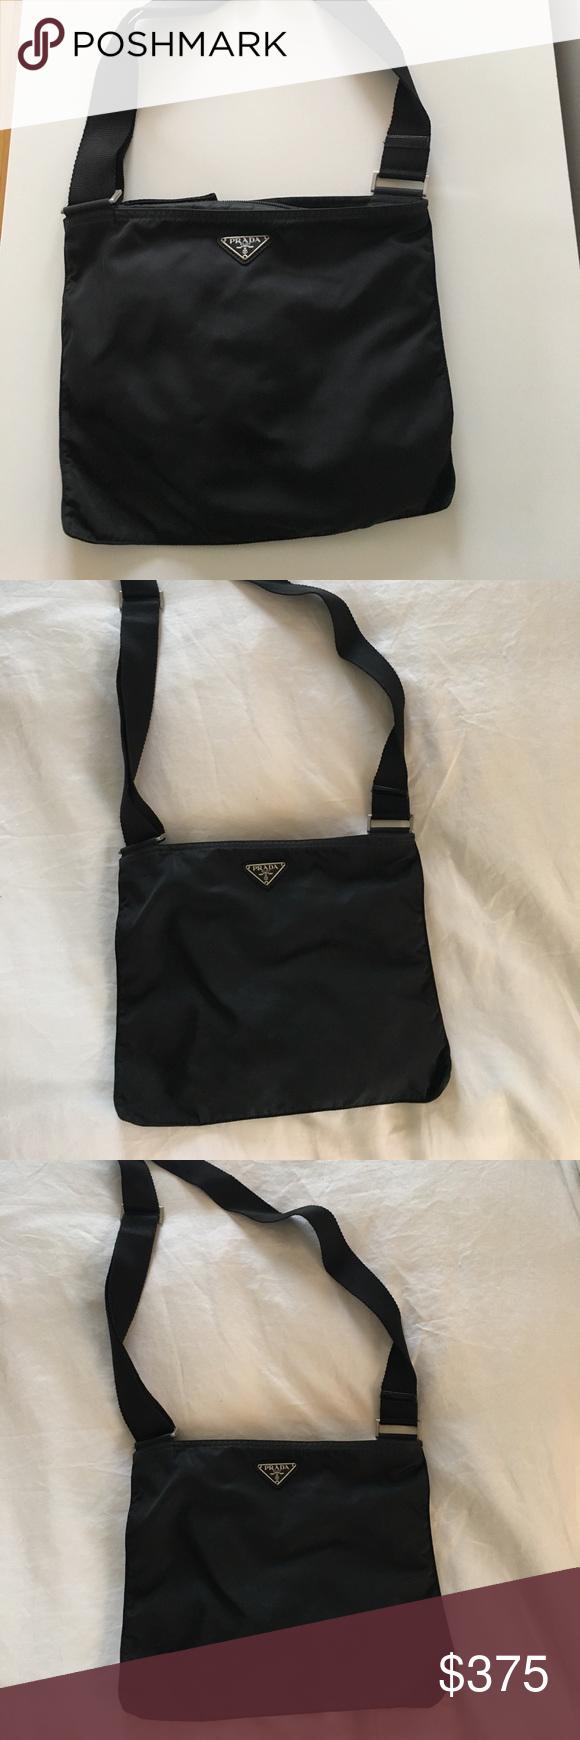 Vintage Prada Nylon Vela Crossbody Messenger Bag Black vintage Prada  messenger cross body bag.  No Trades  Prada Bags Crossbody Bags 5518a29d0c